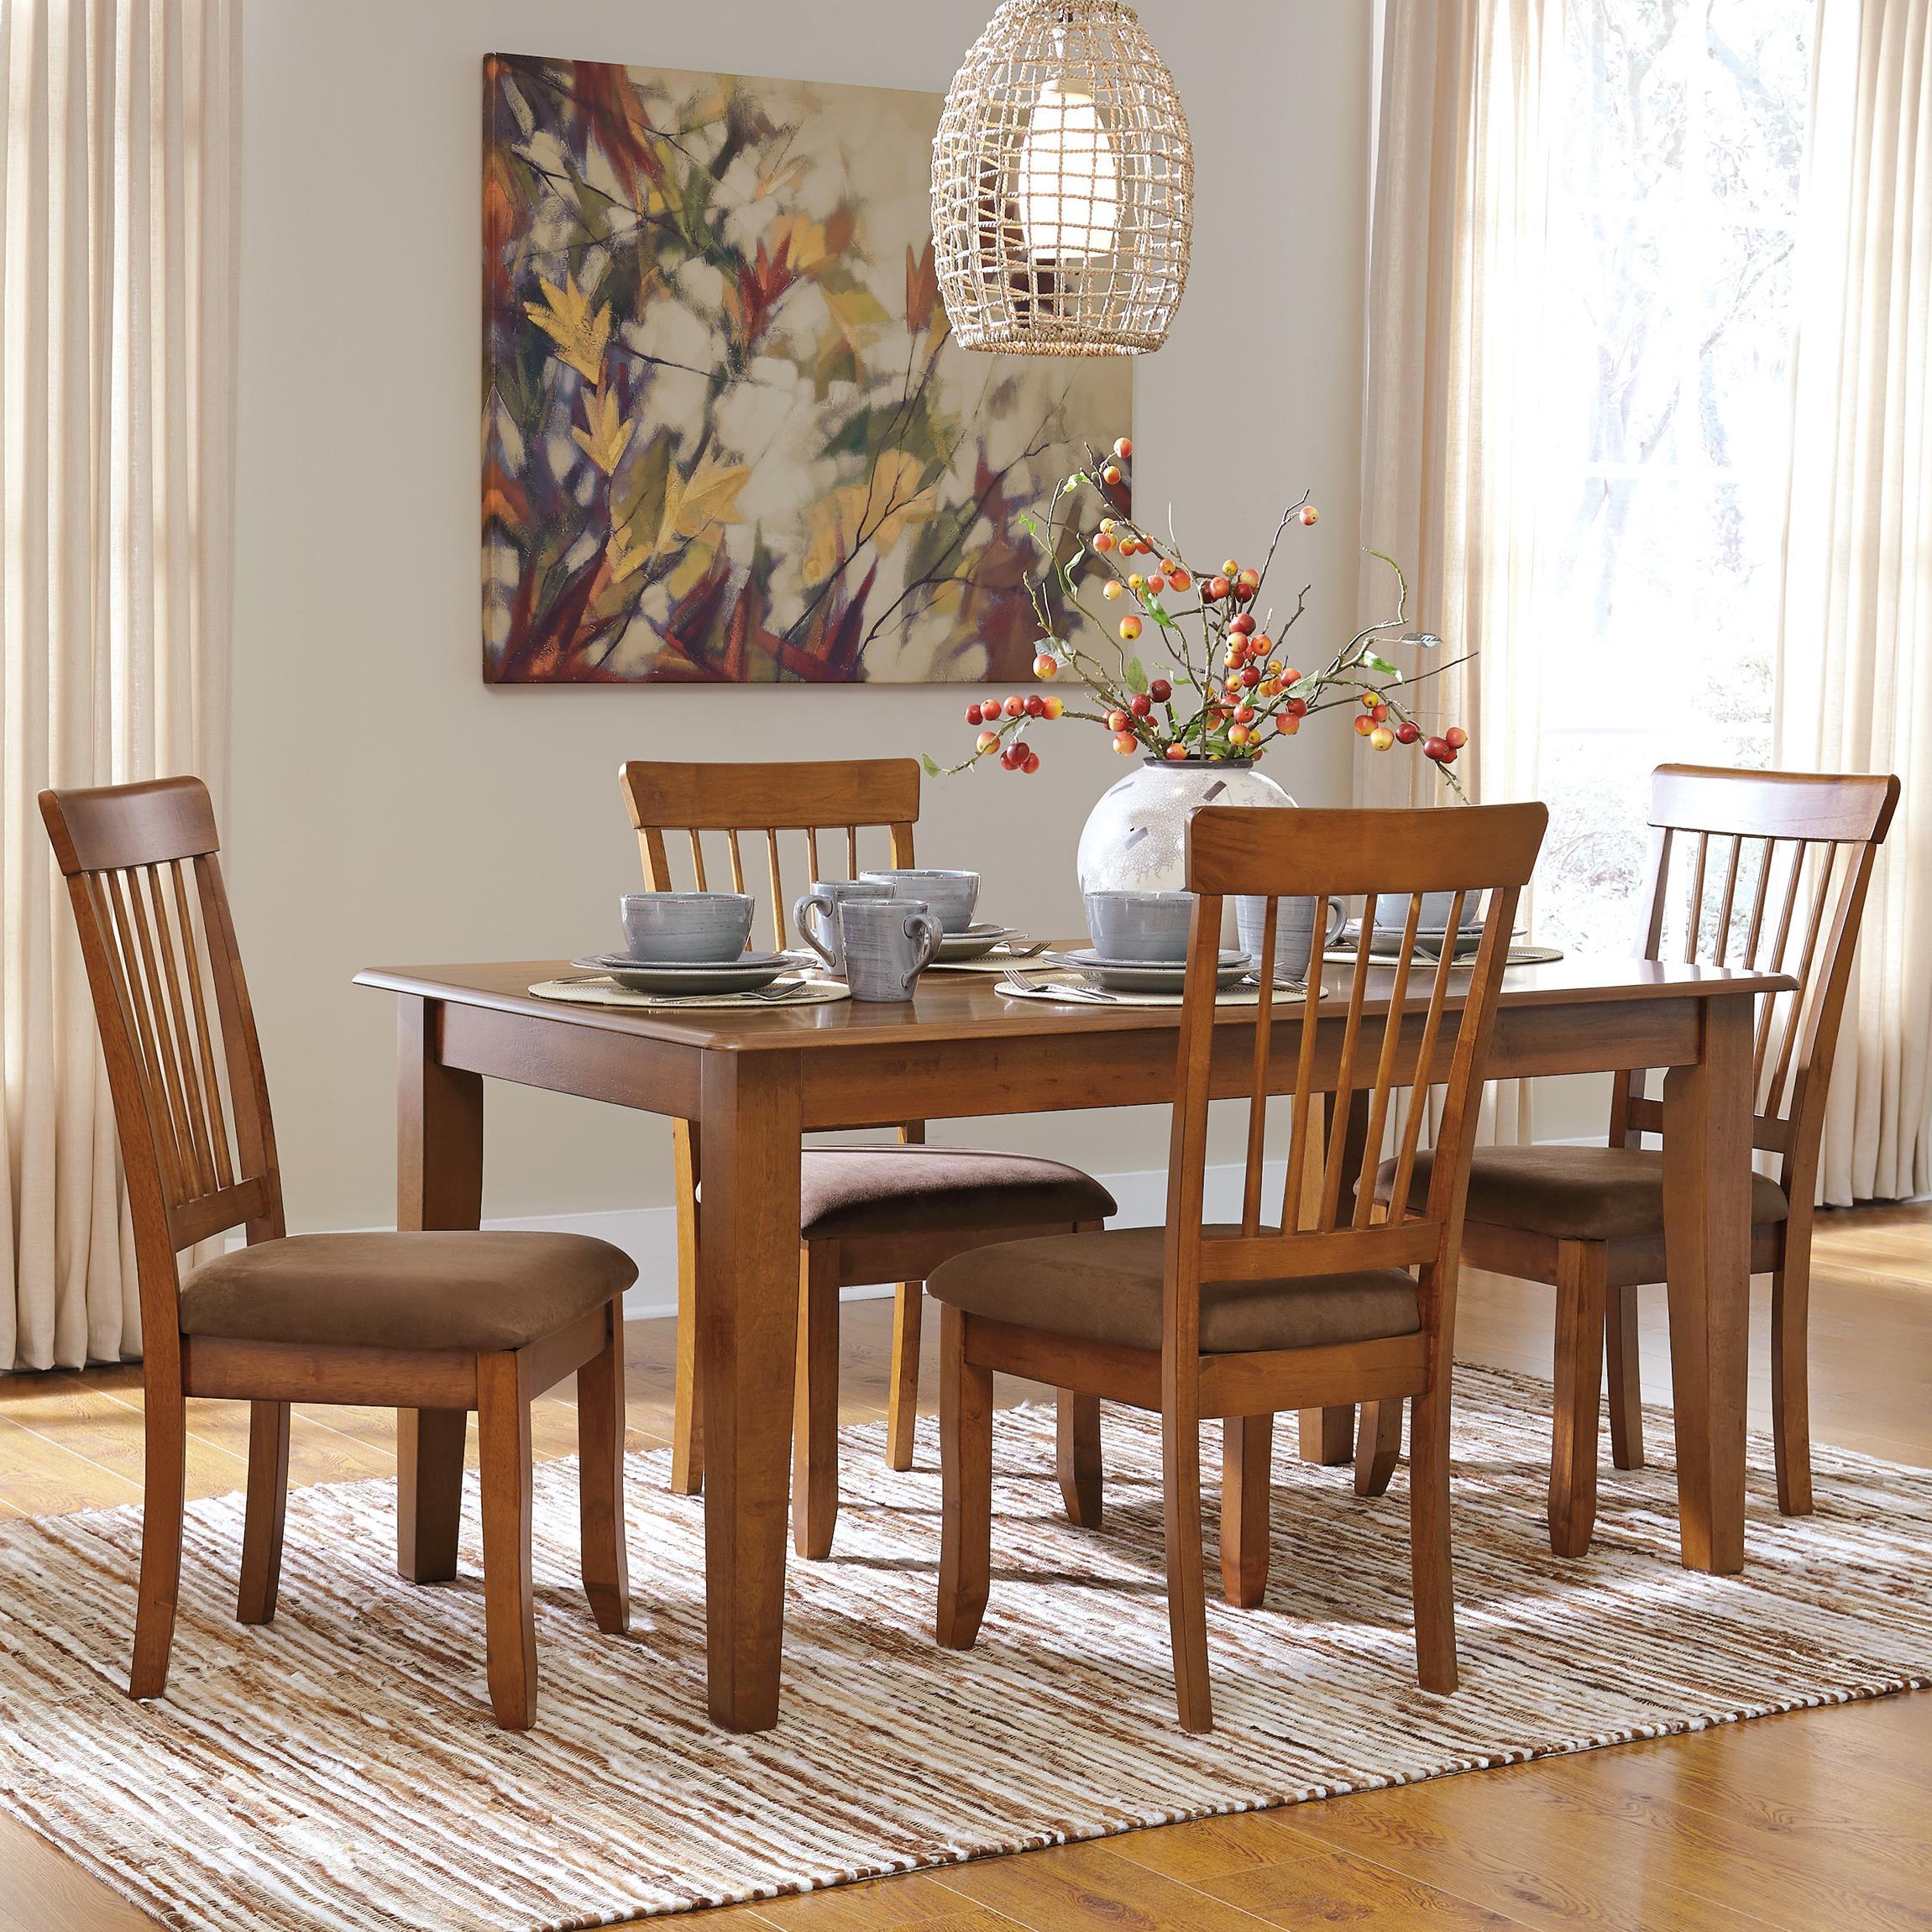 Ashley Furniture Berringer 5Piece 36x60 Table  Chair Set